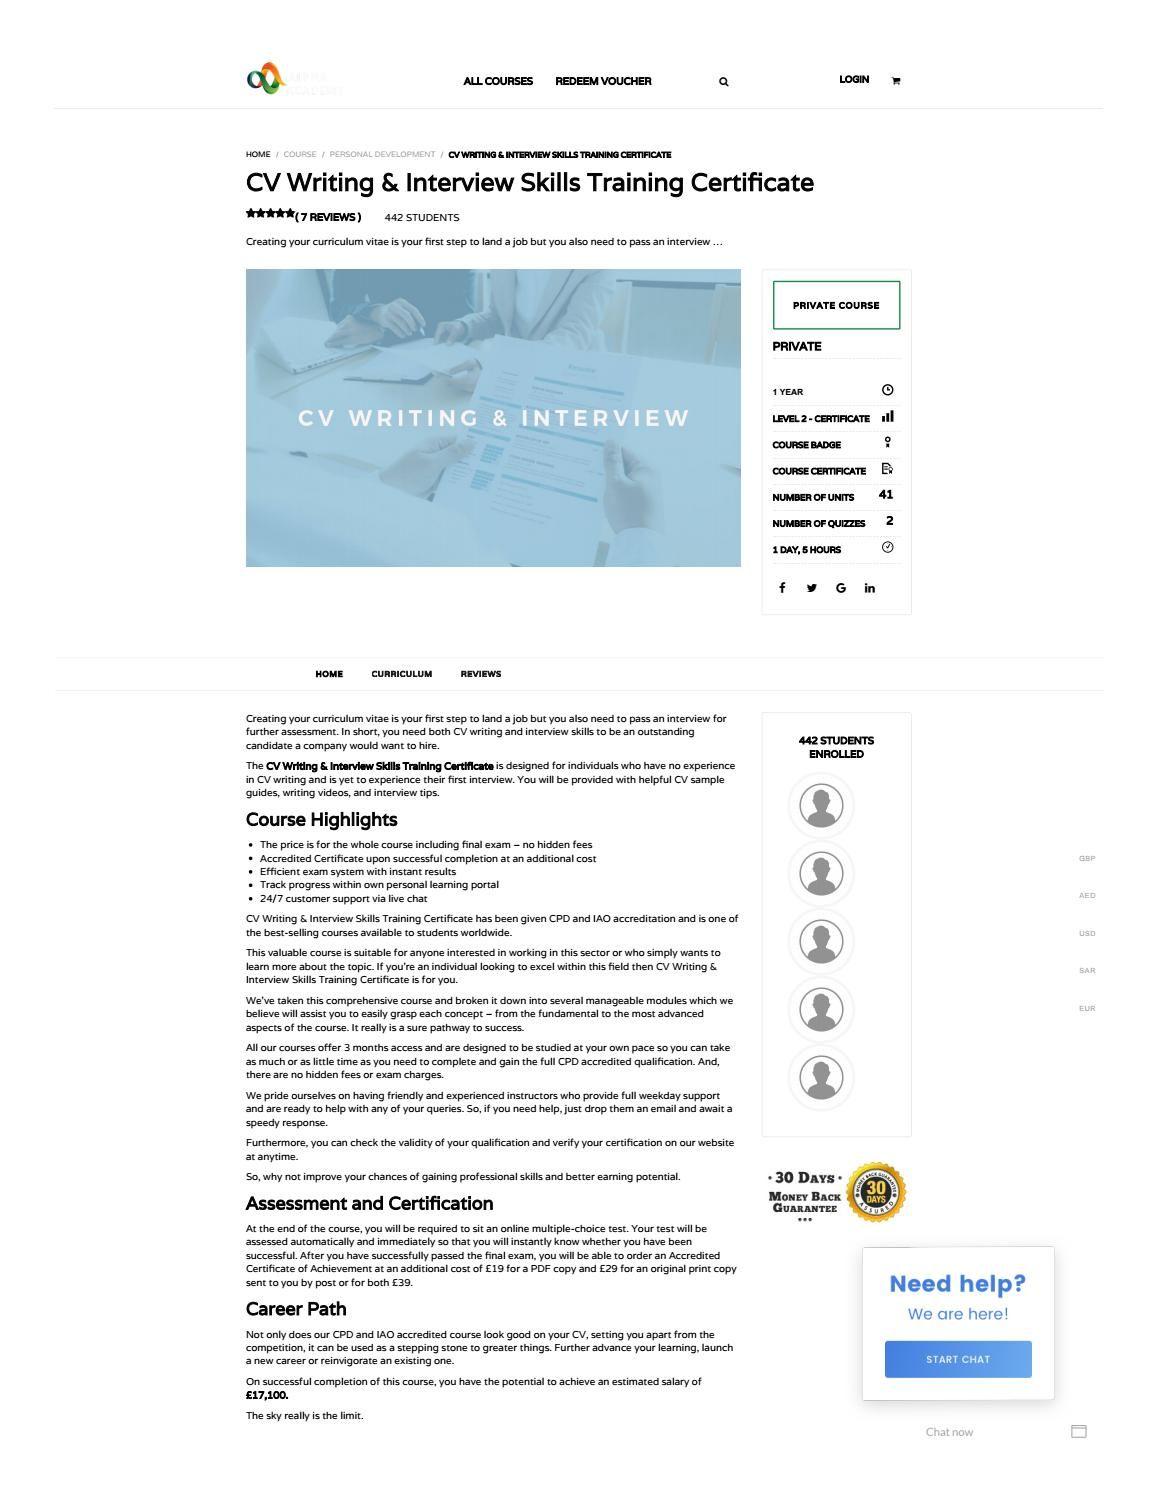 CV Writing & Interview Skills Training Certificate Alpha